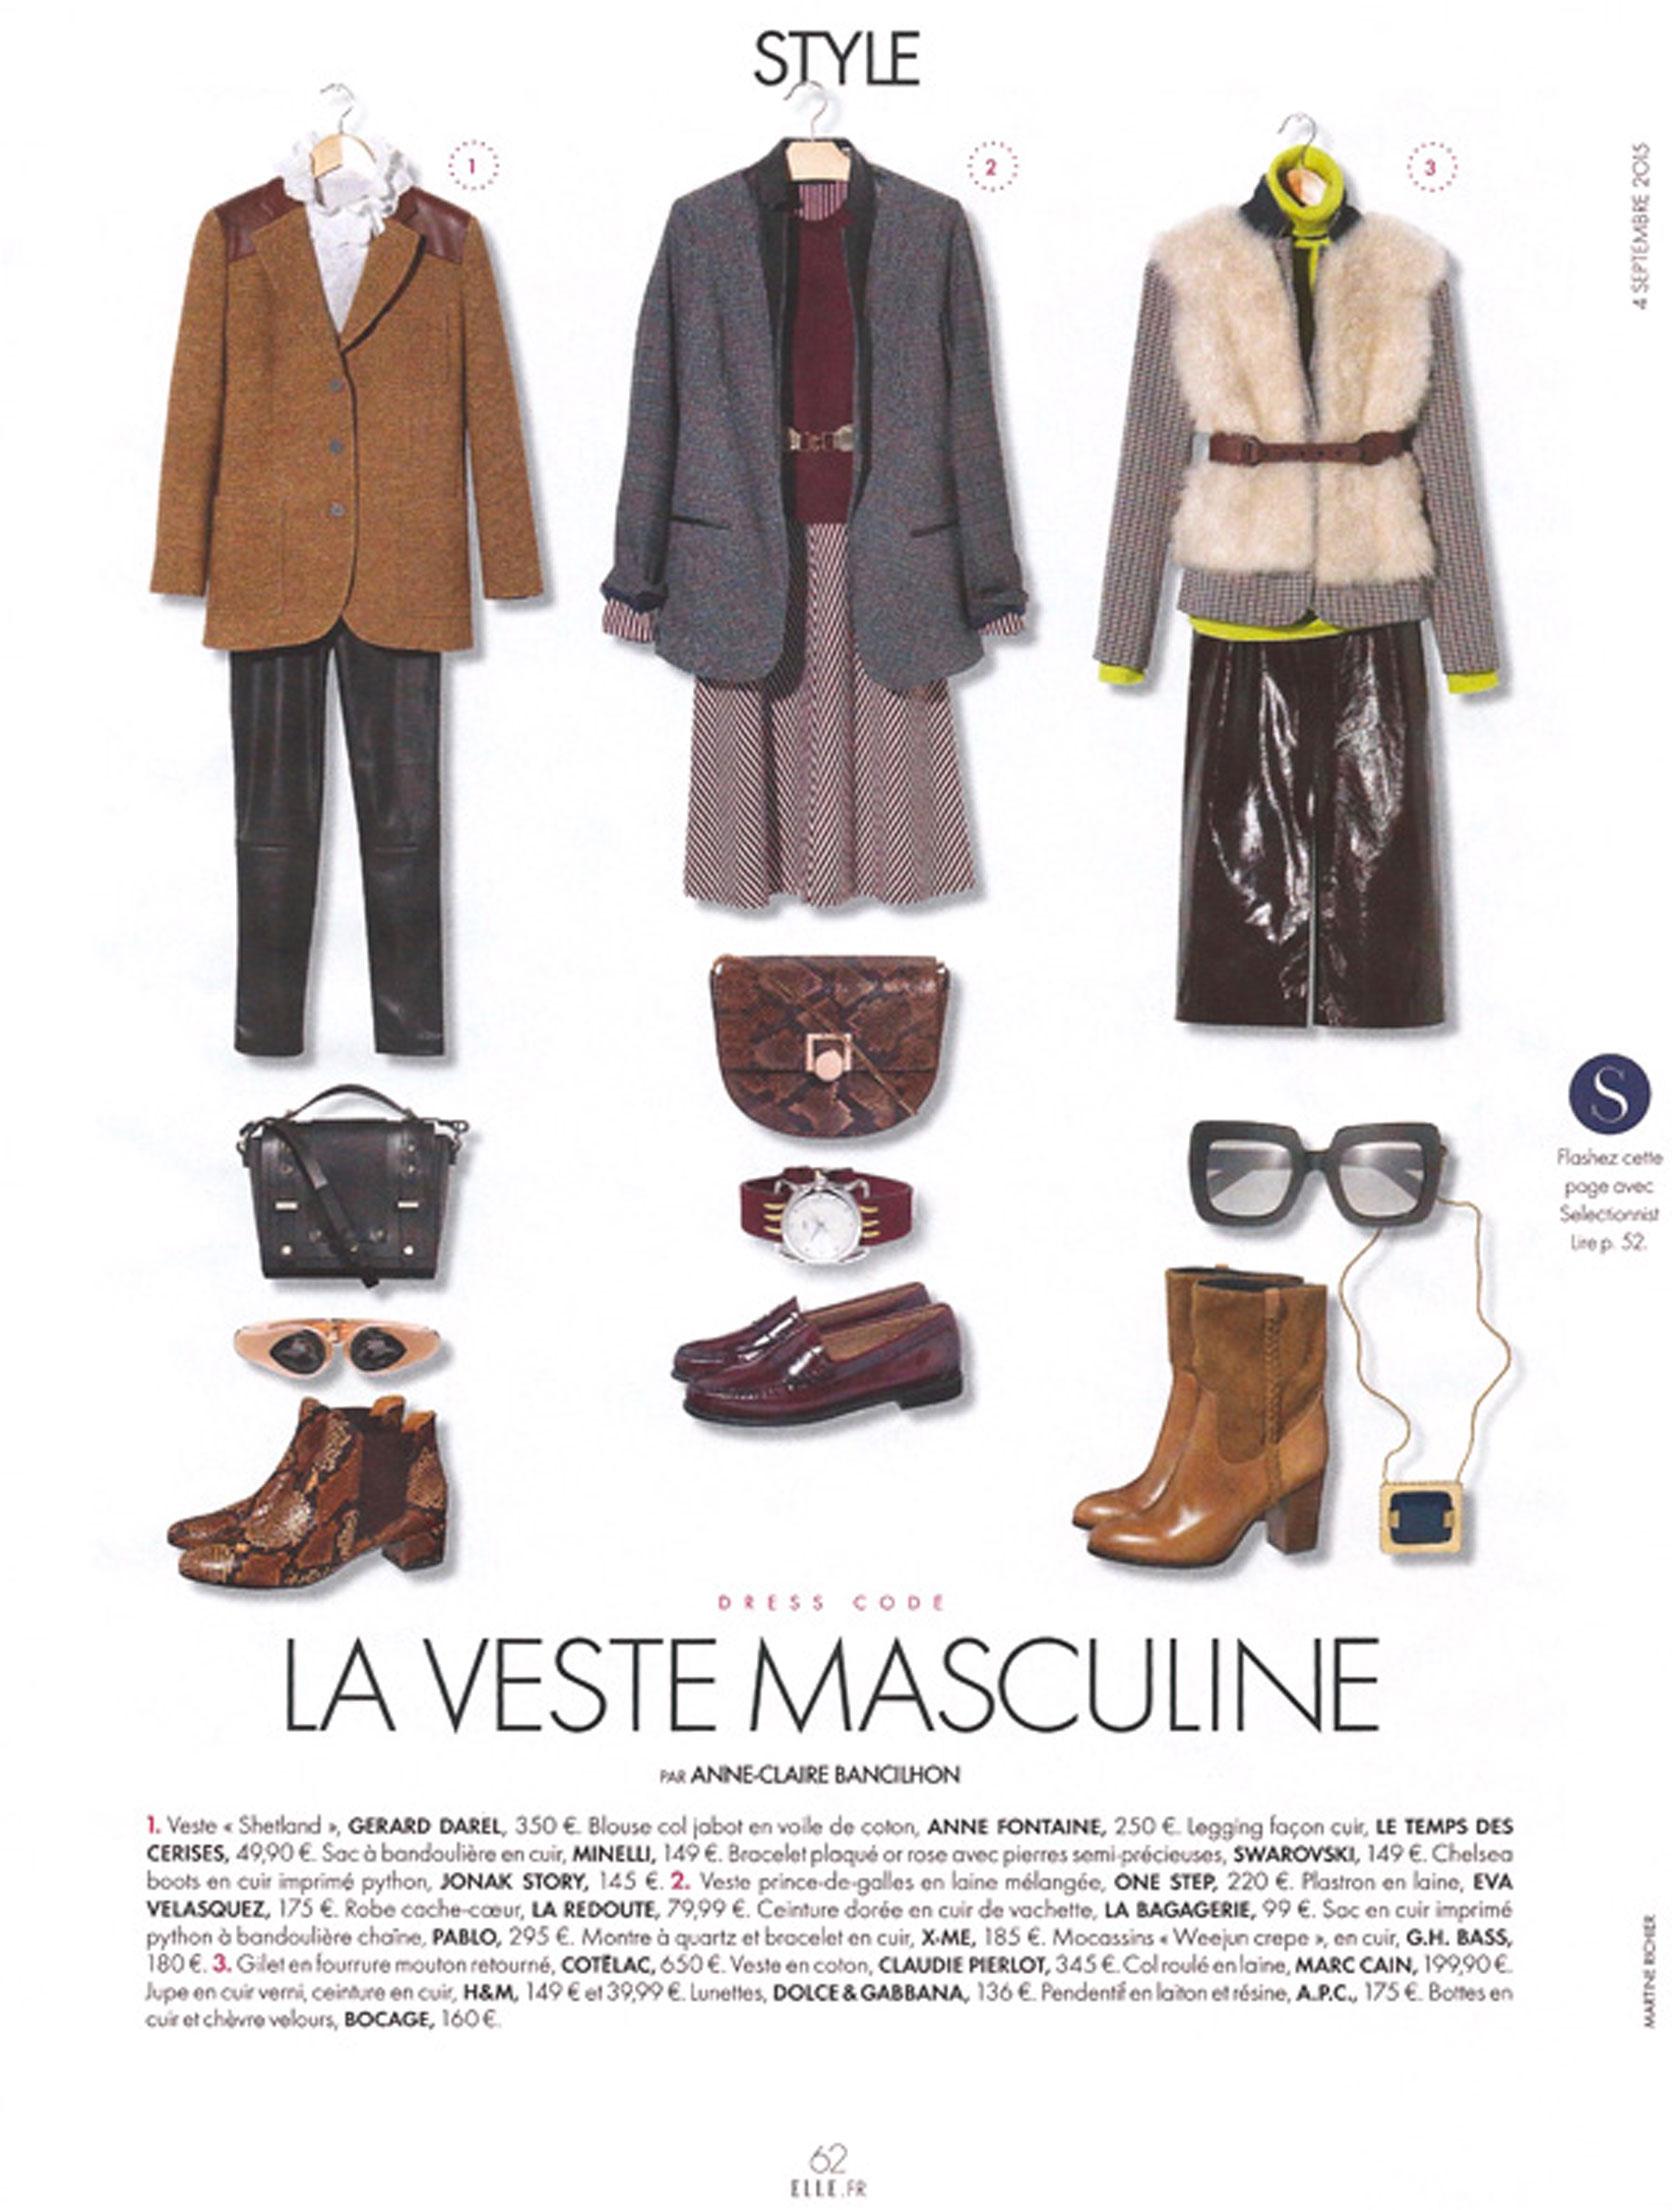 Elle-veste-masculine_web.jpg